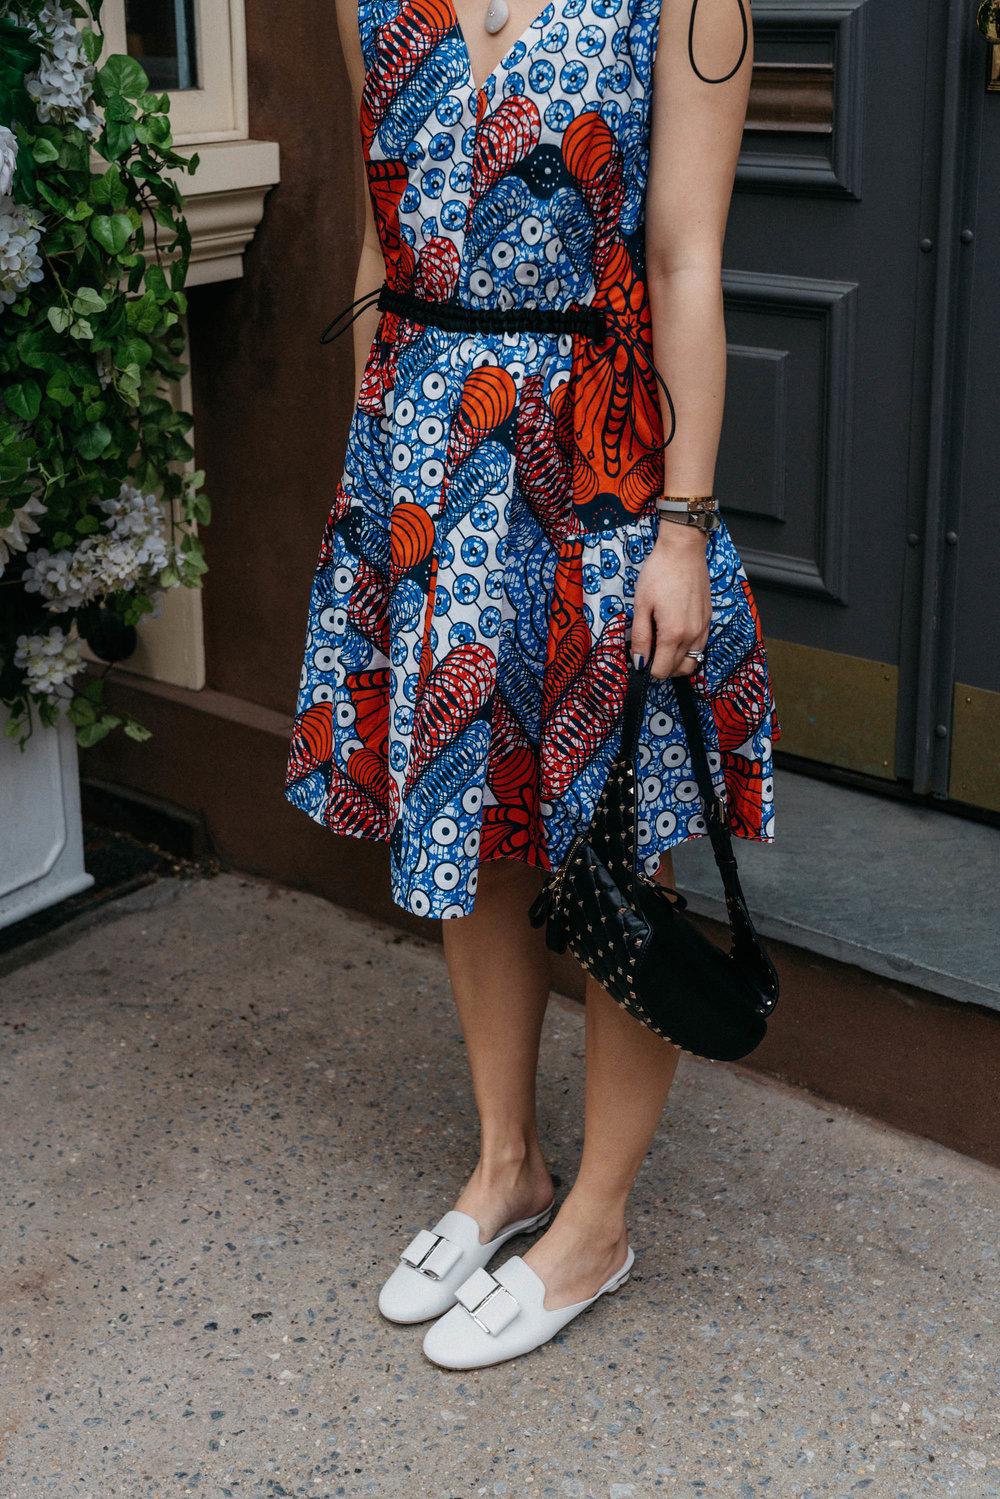 Stella McCartney Dress,  Valentino Bag ,  Salvatore Ferragamo Shoes